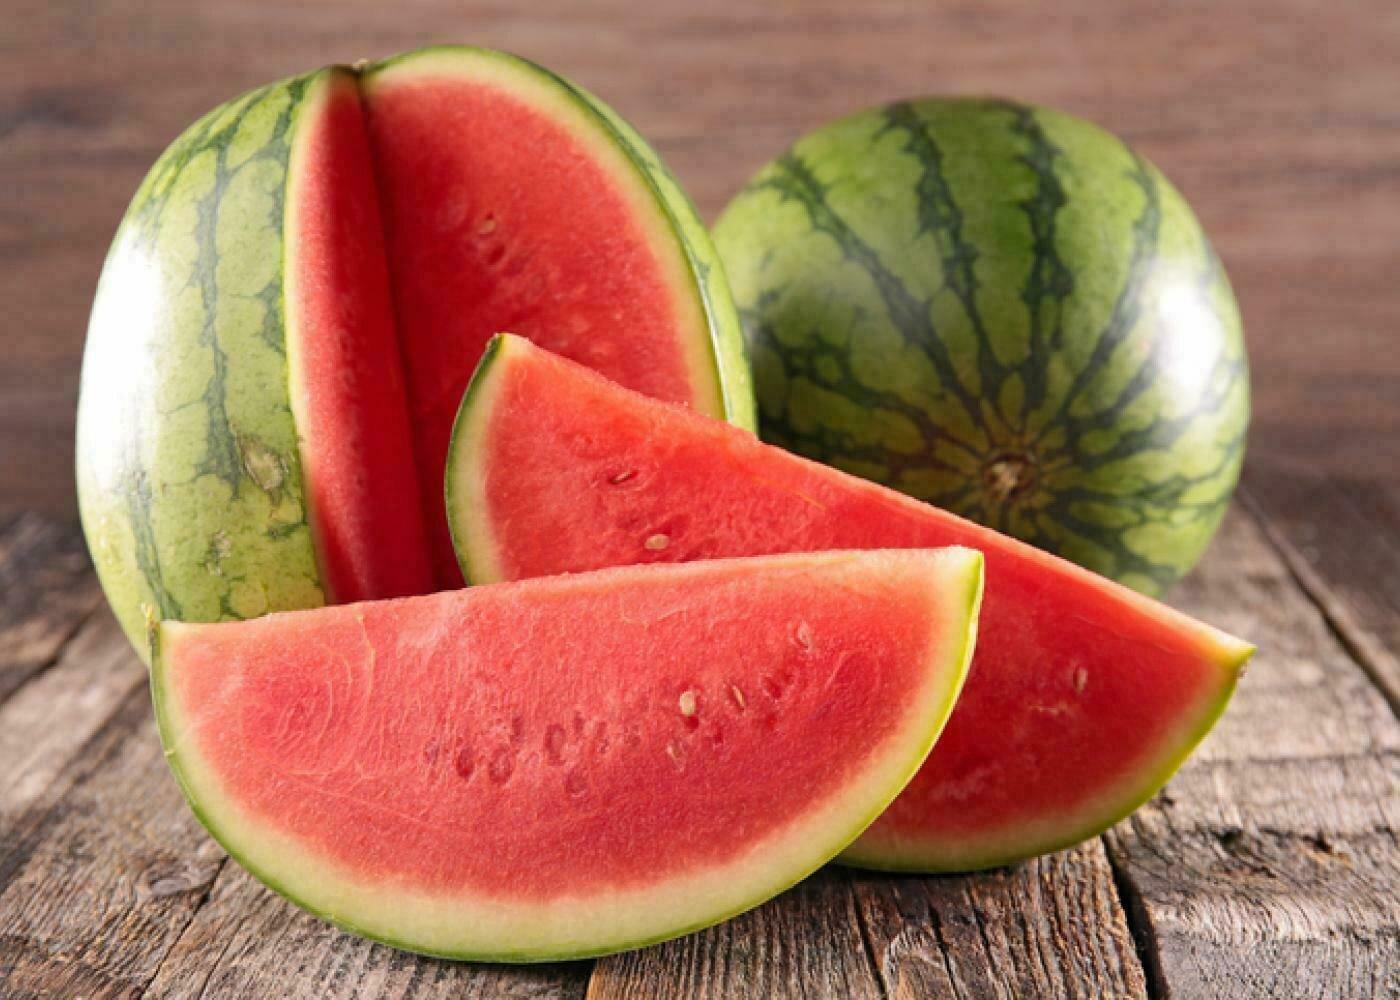 Watermelon بطيخ (Kg) - Our Selection